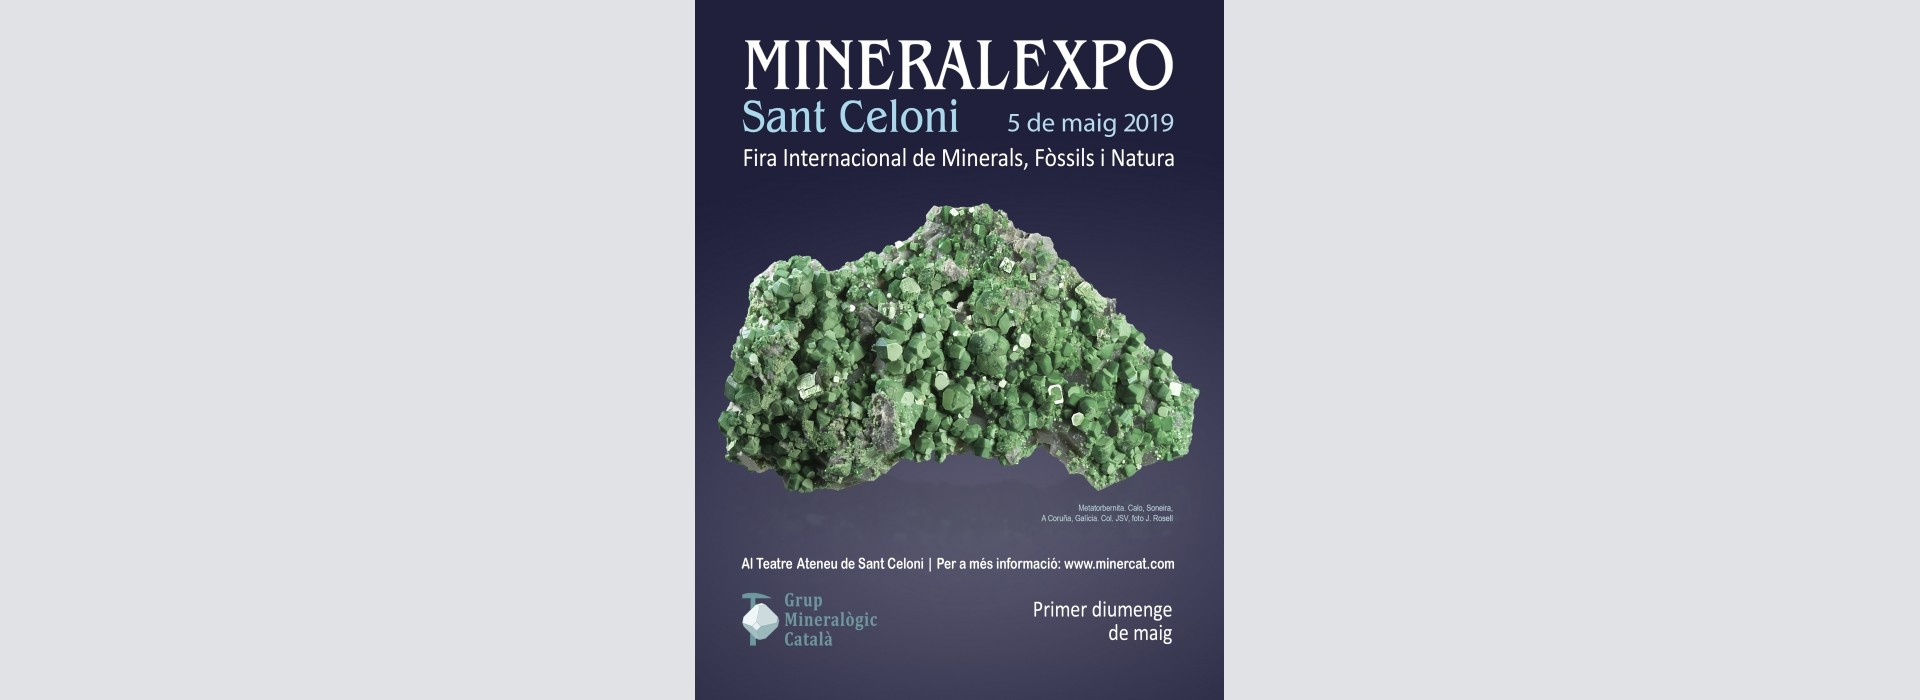 MineralExpo Sant Celoni 2019